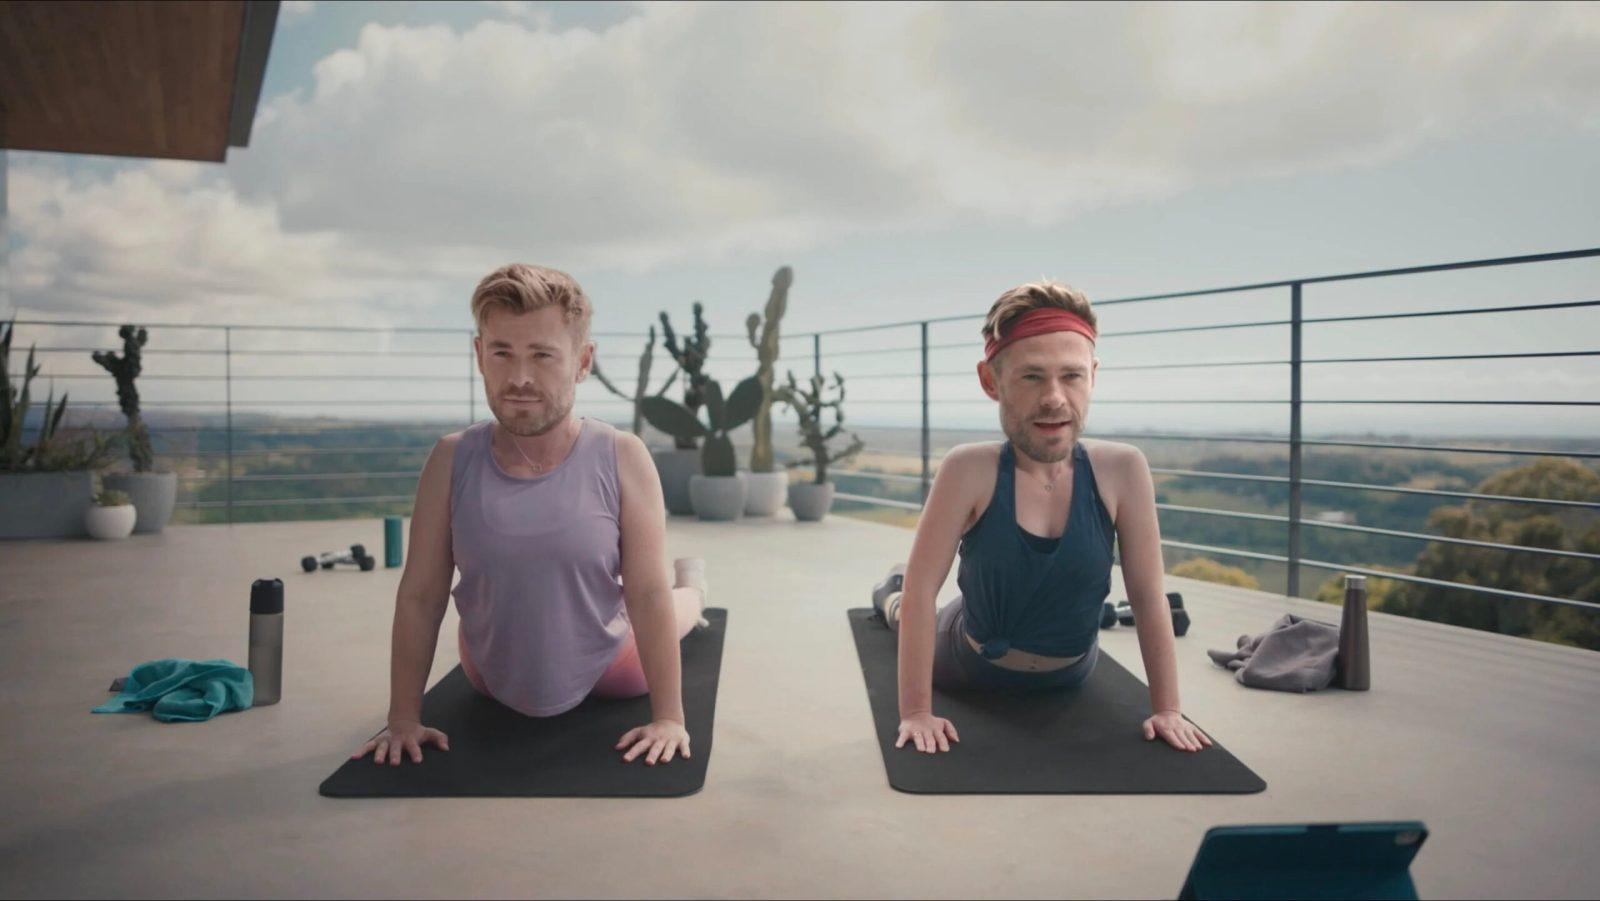 Chris Hemsworth pokes fun at himself in new Centr fitness app ad